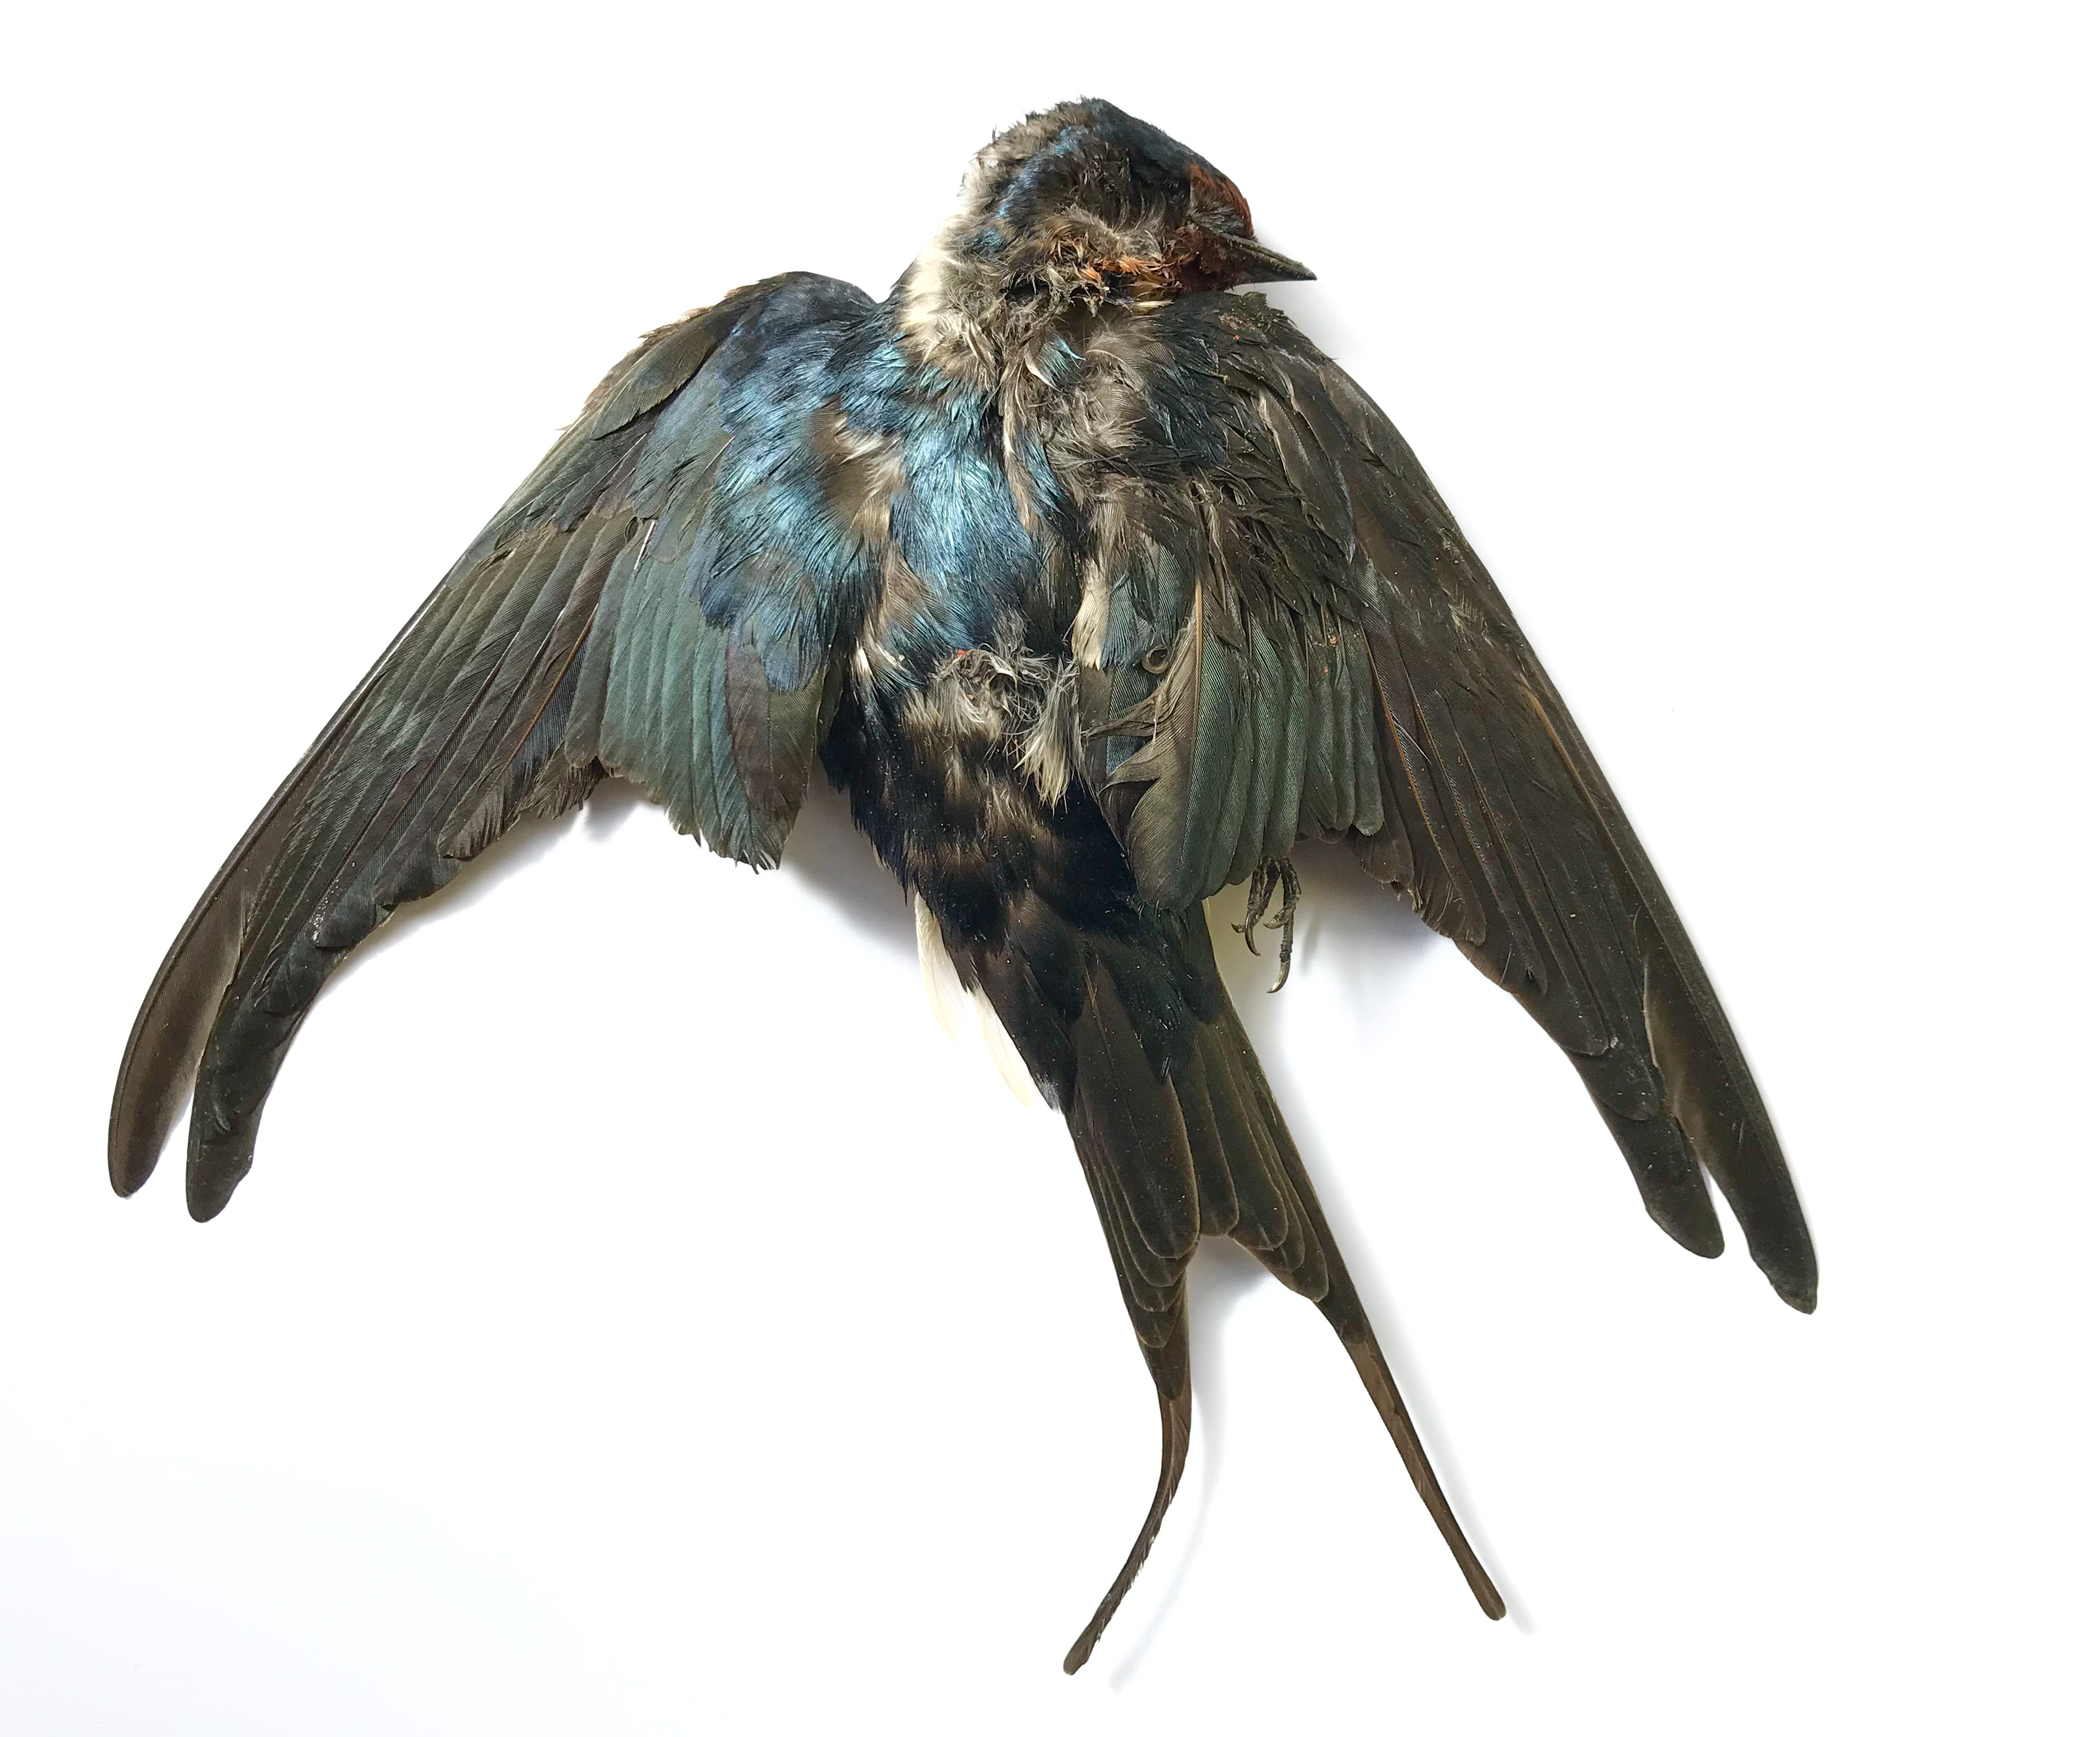 Barn Swallow. Isle of Man, 21 February 2019 (Neil G. Morris)